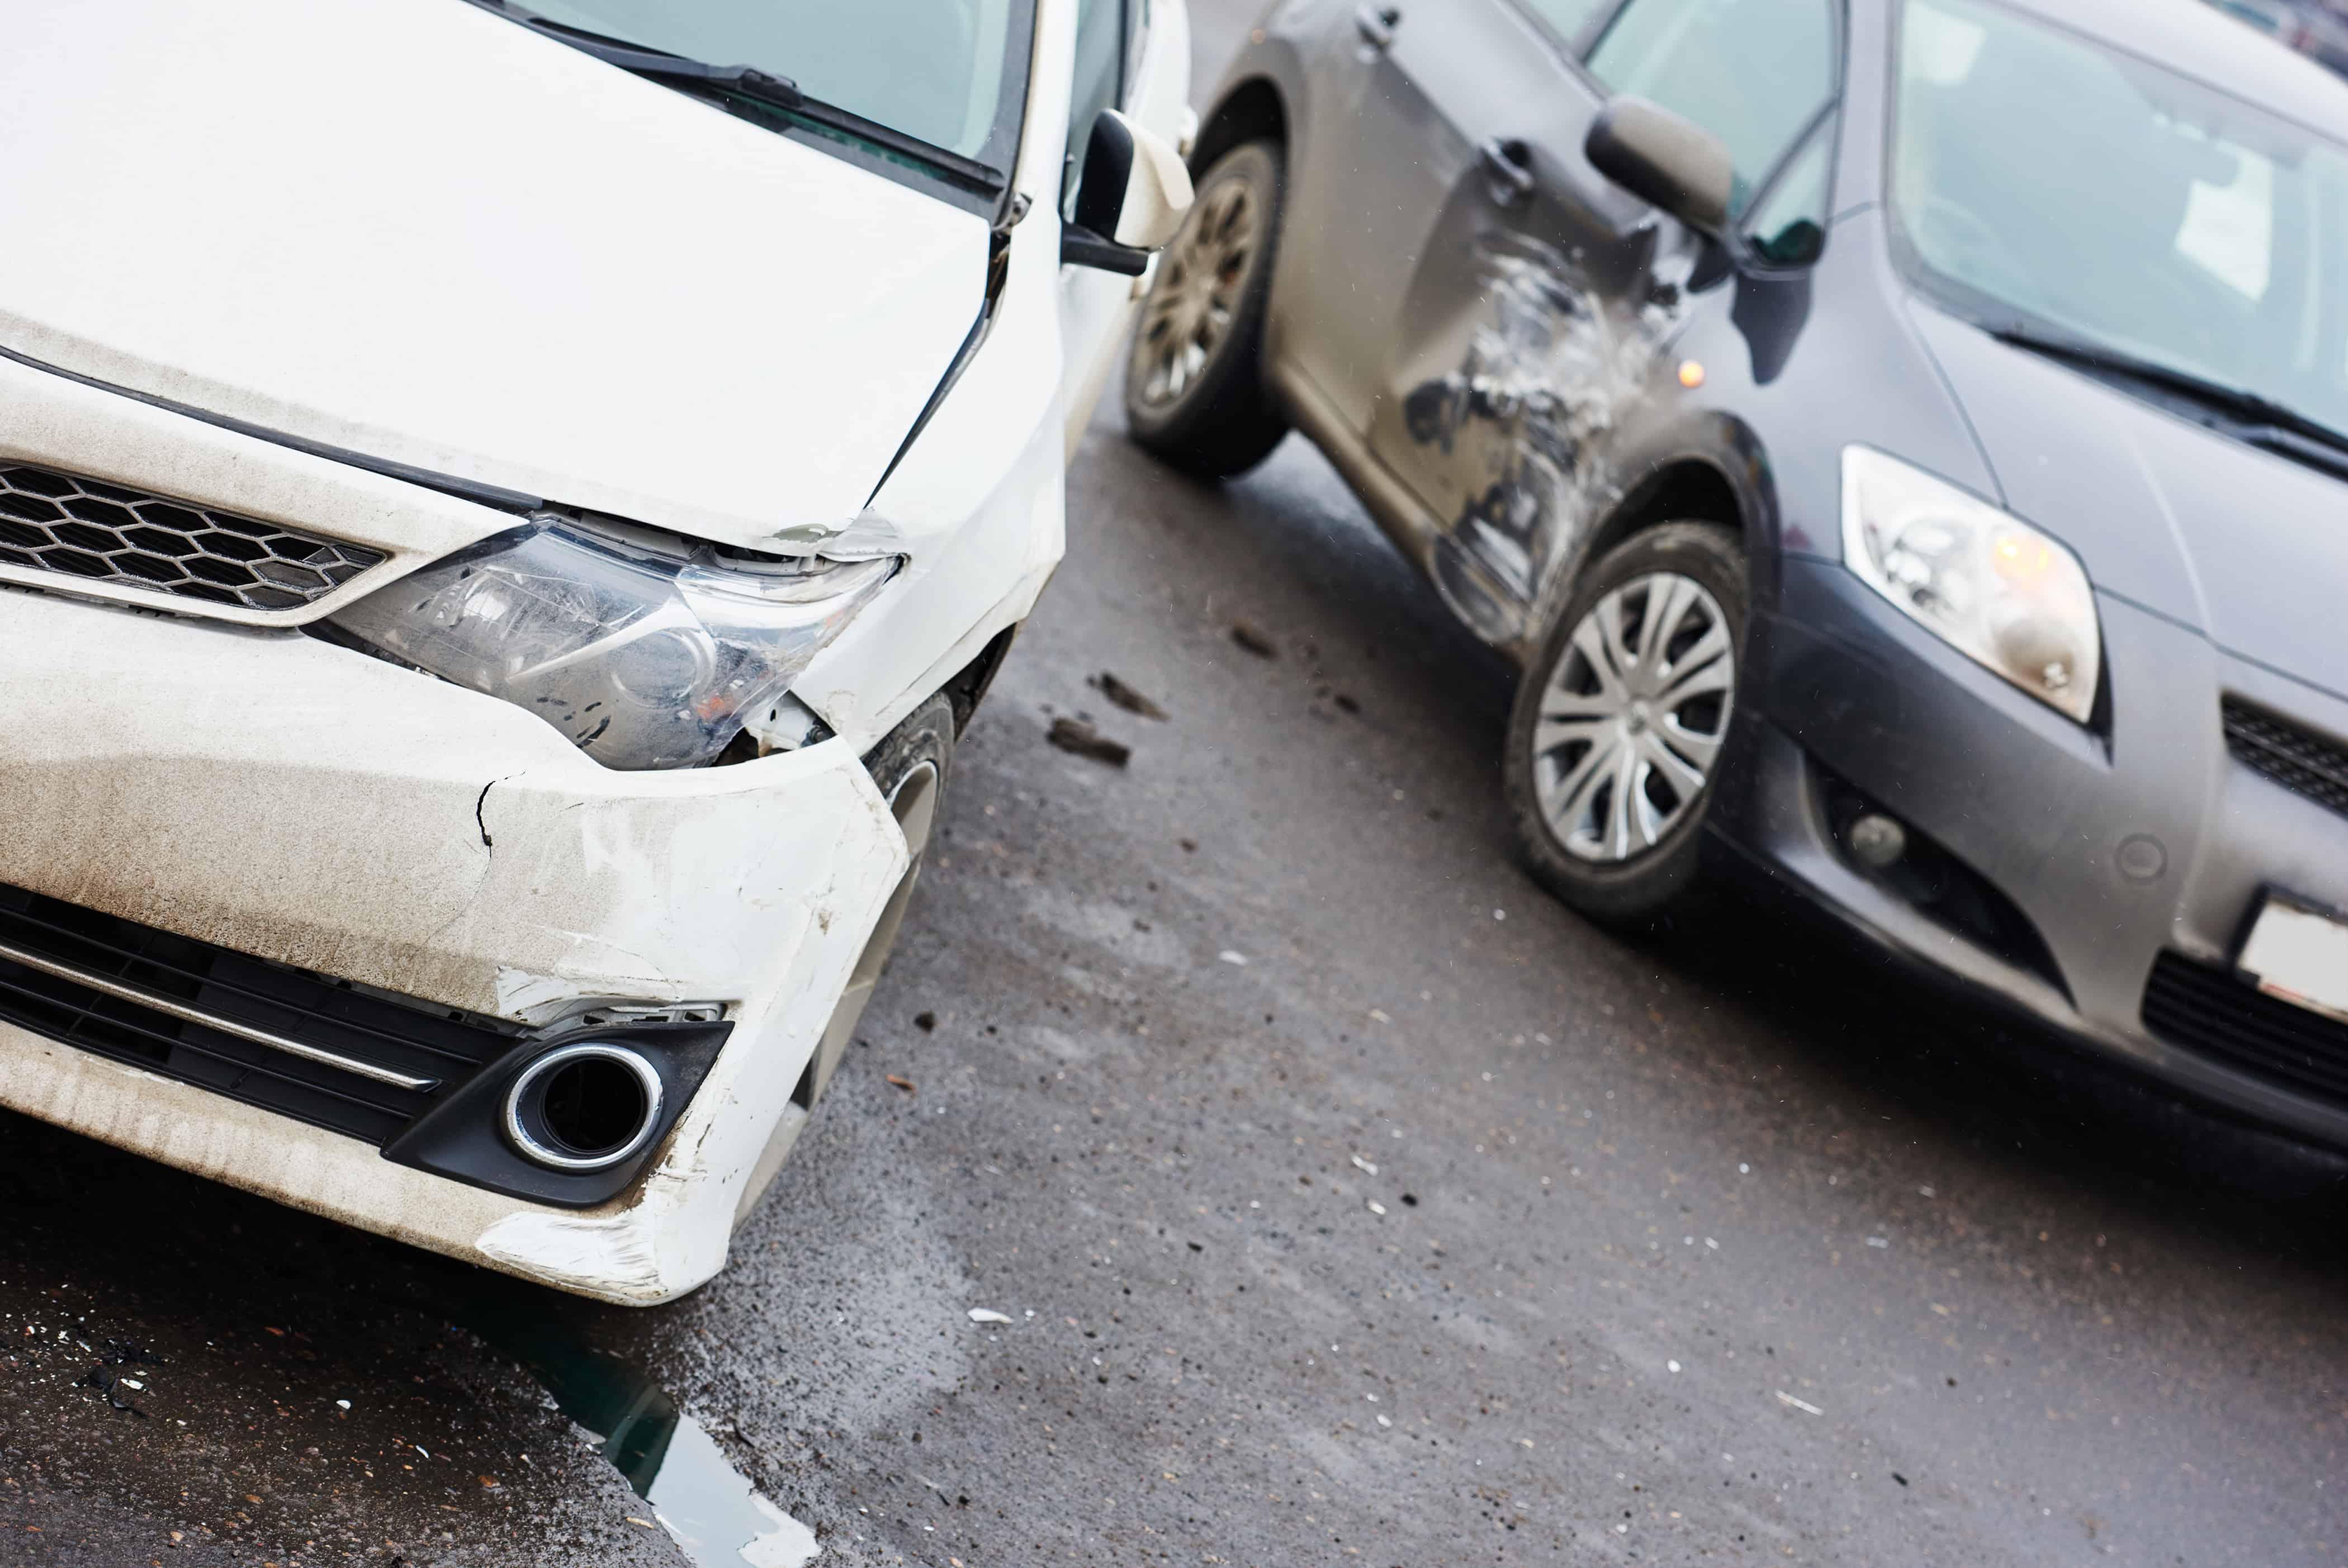 San Jose Woman Dies in Head-On Crash on Highway 680 [San Jose, CA]